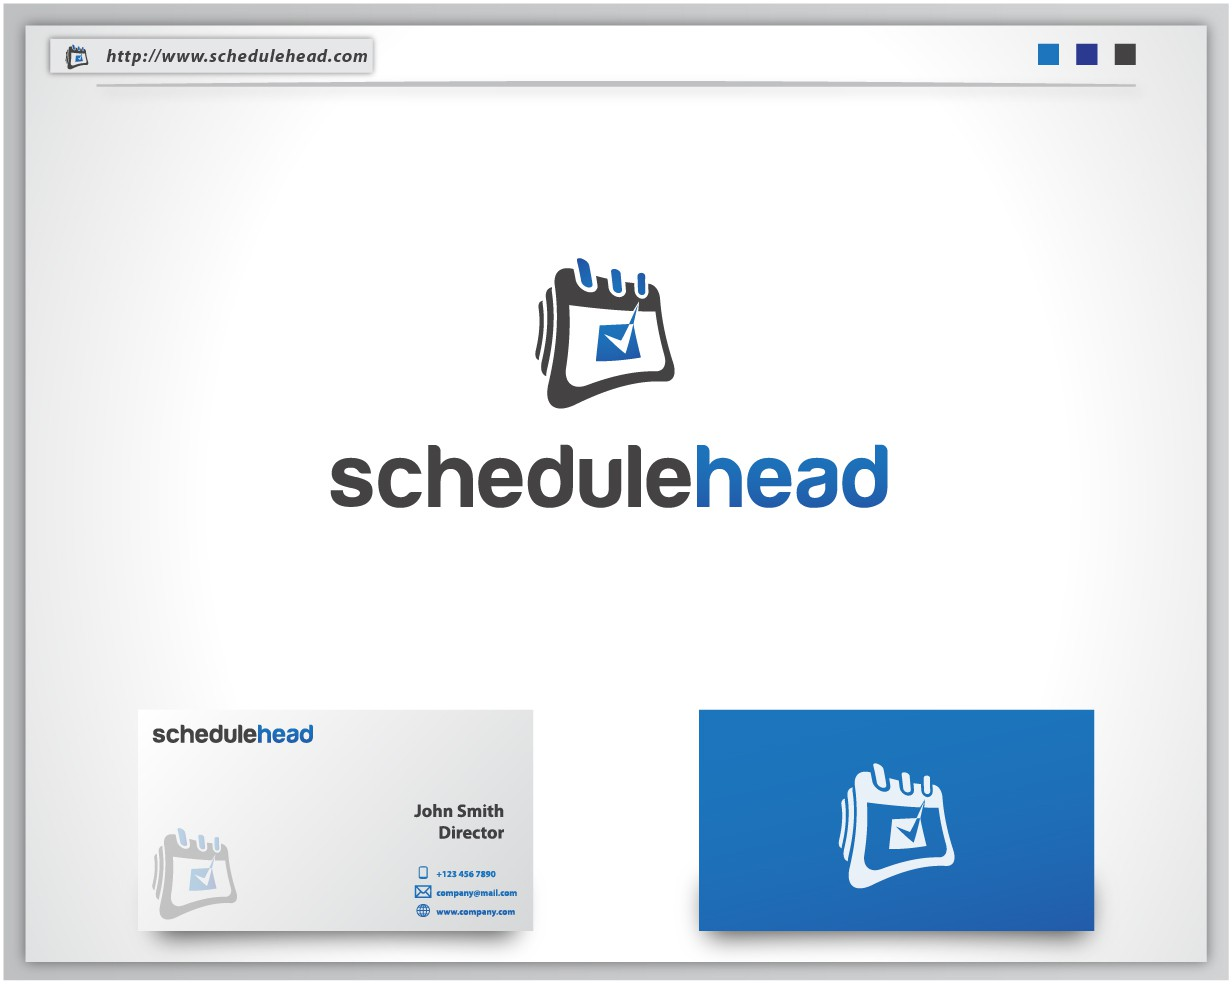 Schedulehead needs a new logo